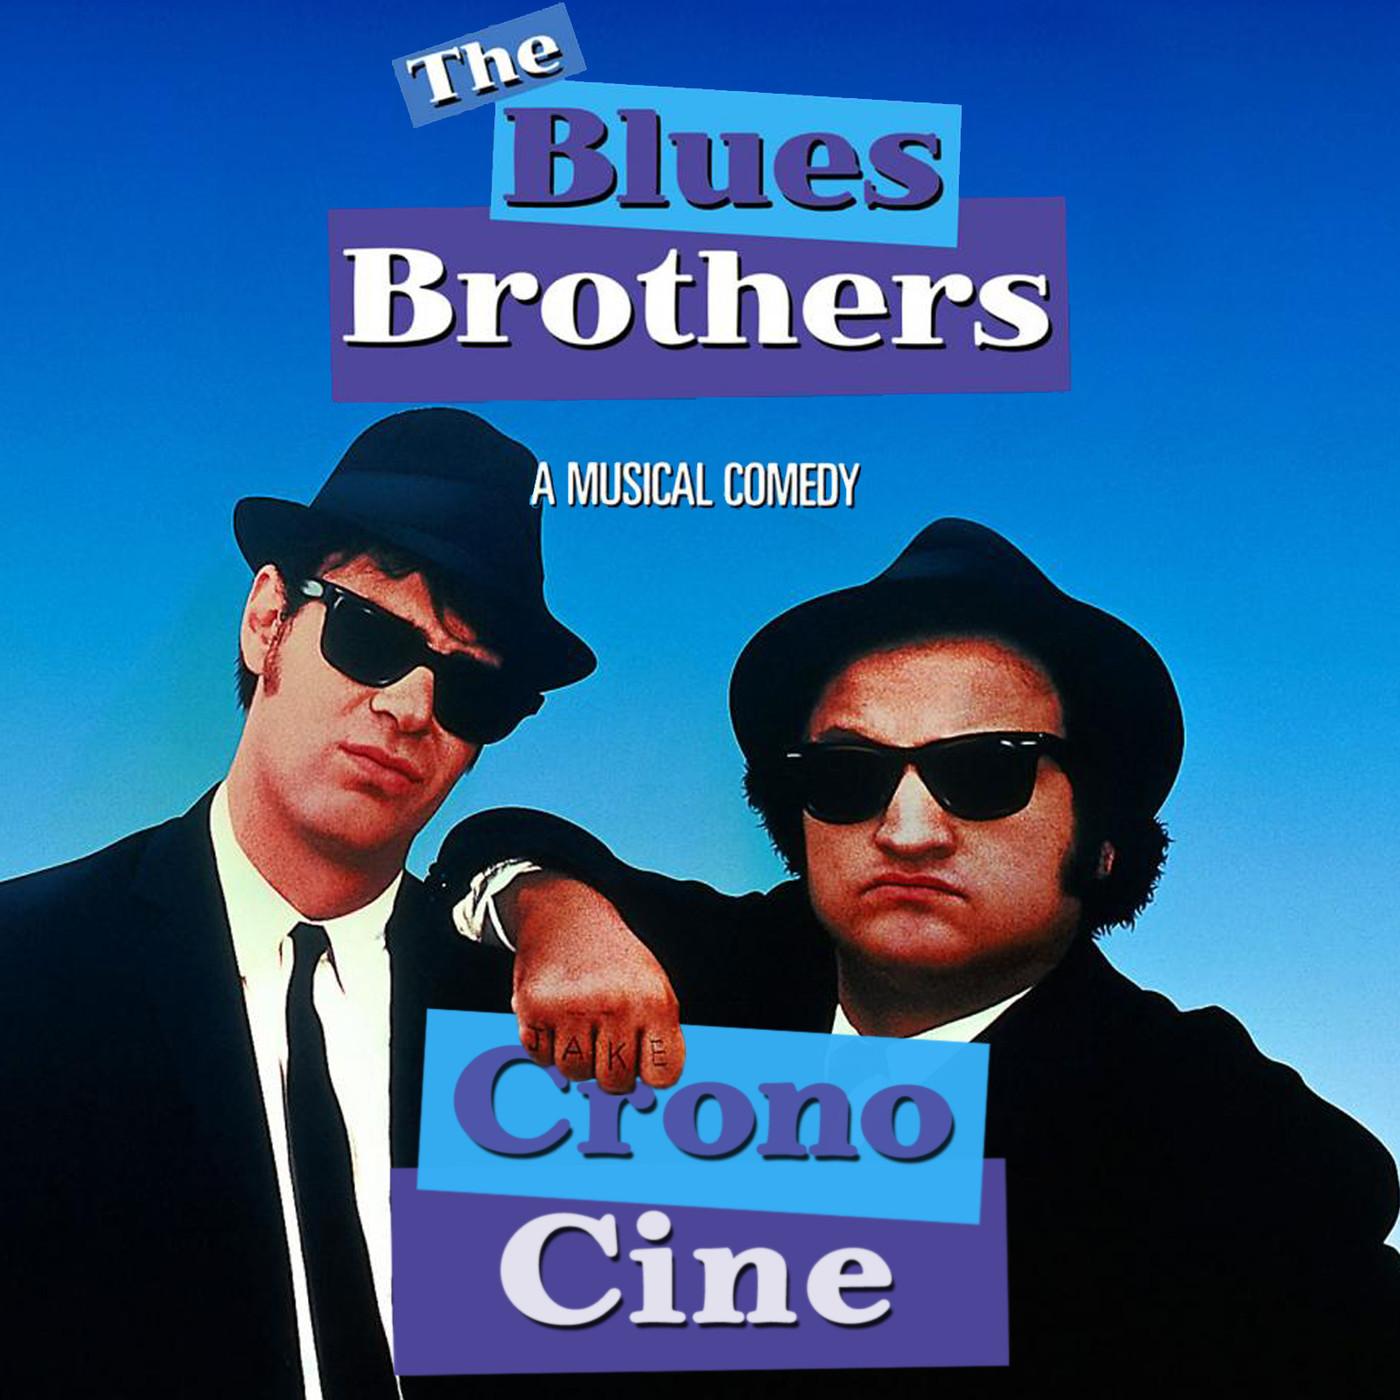 CronoCine 2x11: The Blues Brothers (John Landis, 1980)